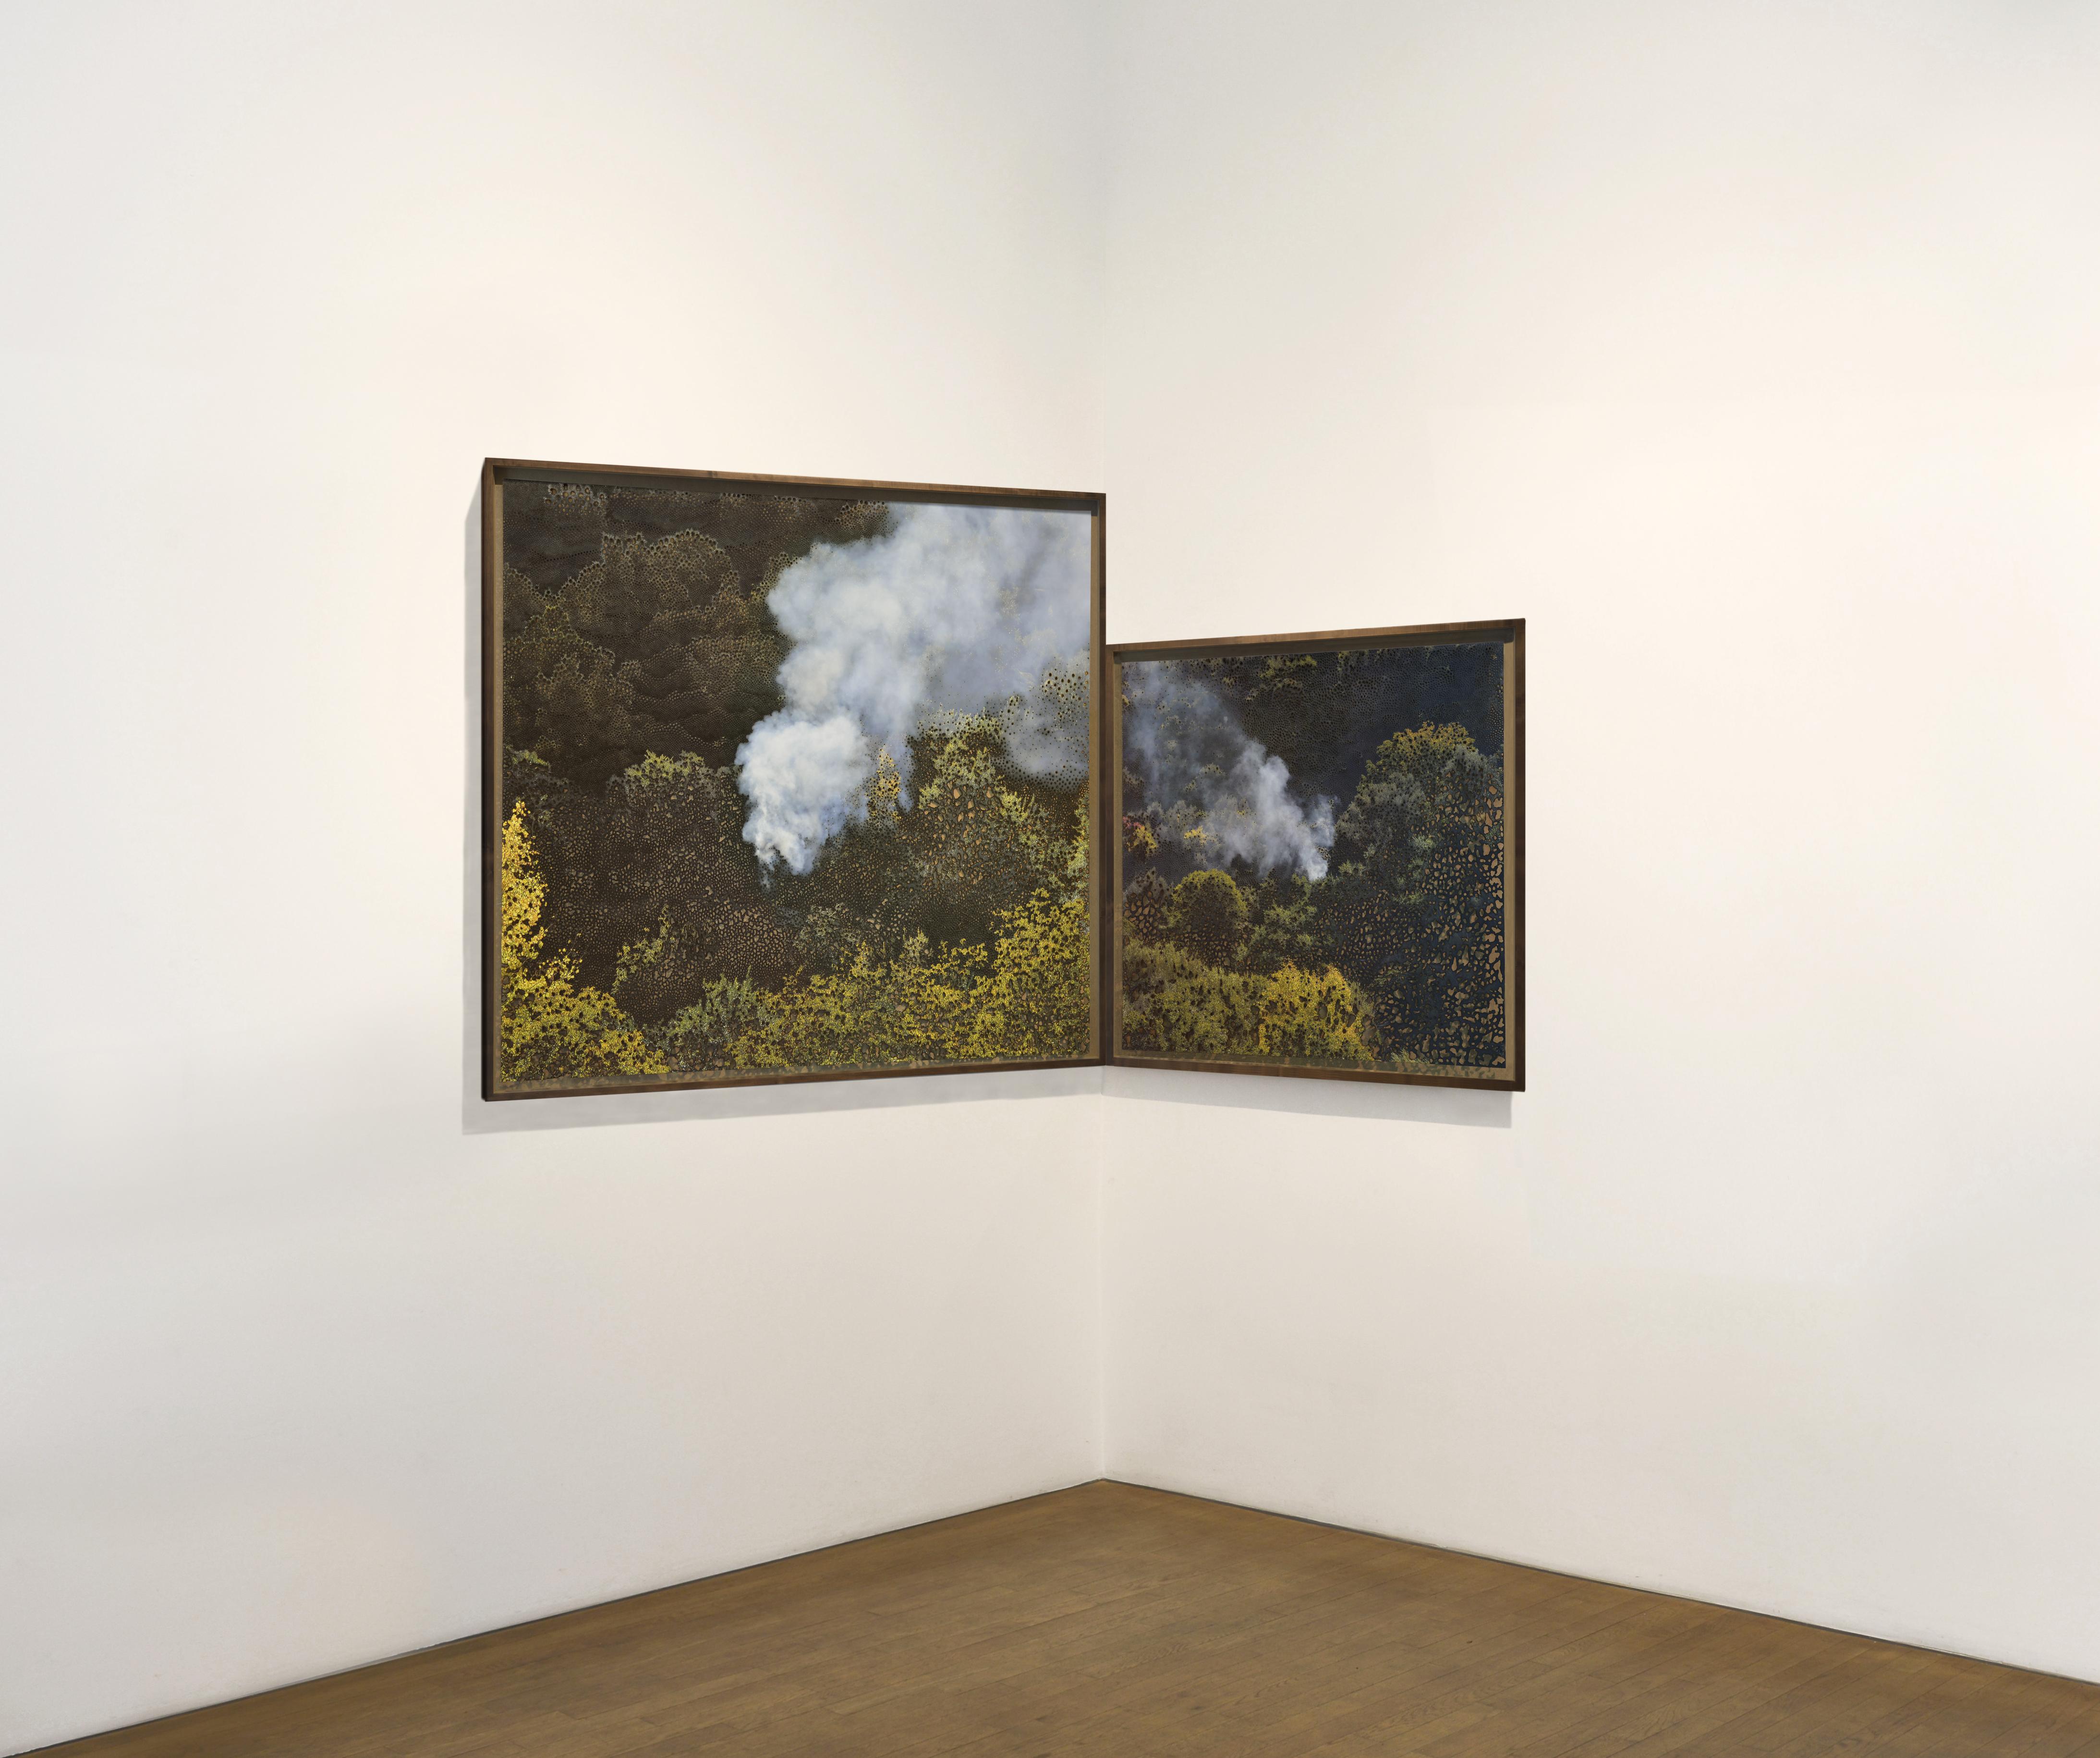 Miguel Rothschild, Groß-und Kleingeist,118 x 206 cm, diptyque,tirages à jet d'encre avec brûlures|_@_||_@_||_@_|